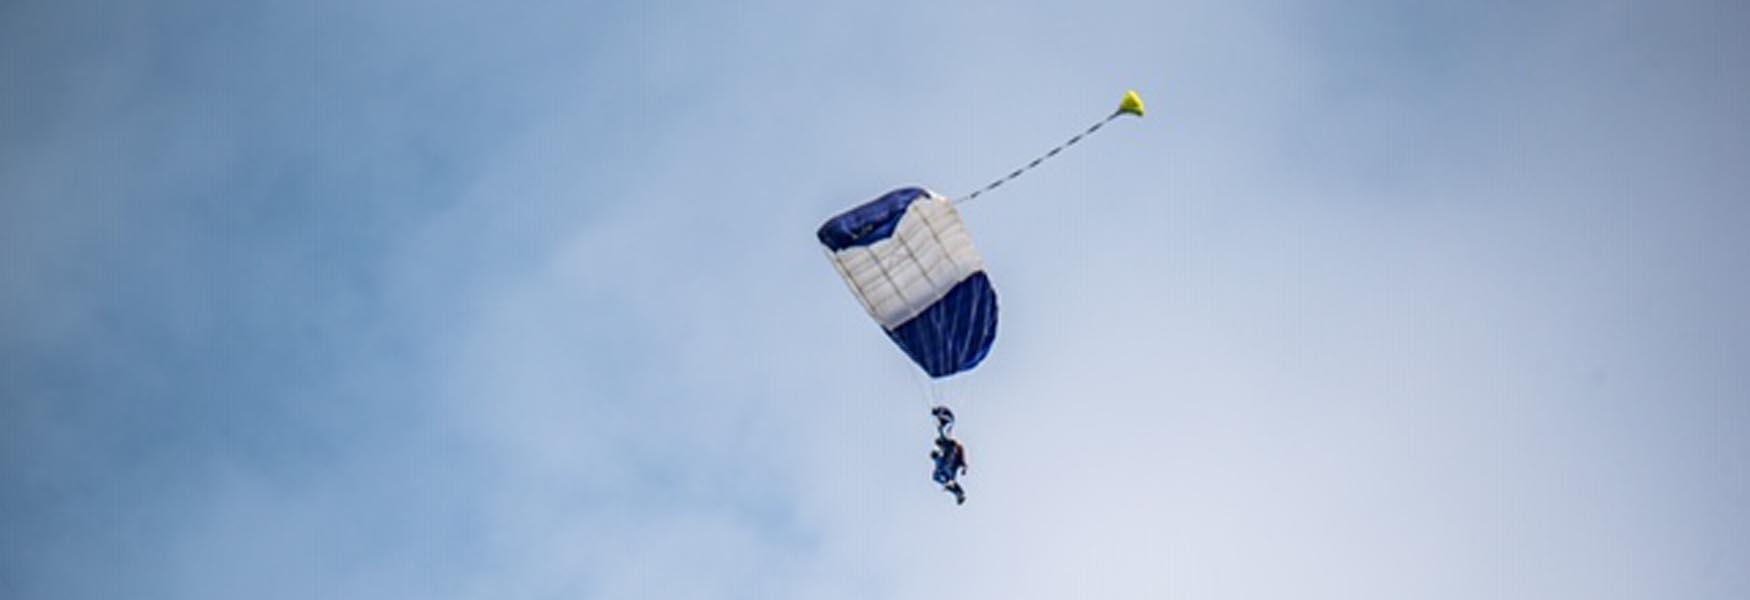 Tandem Skydive, Headcorn Aerodrome